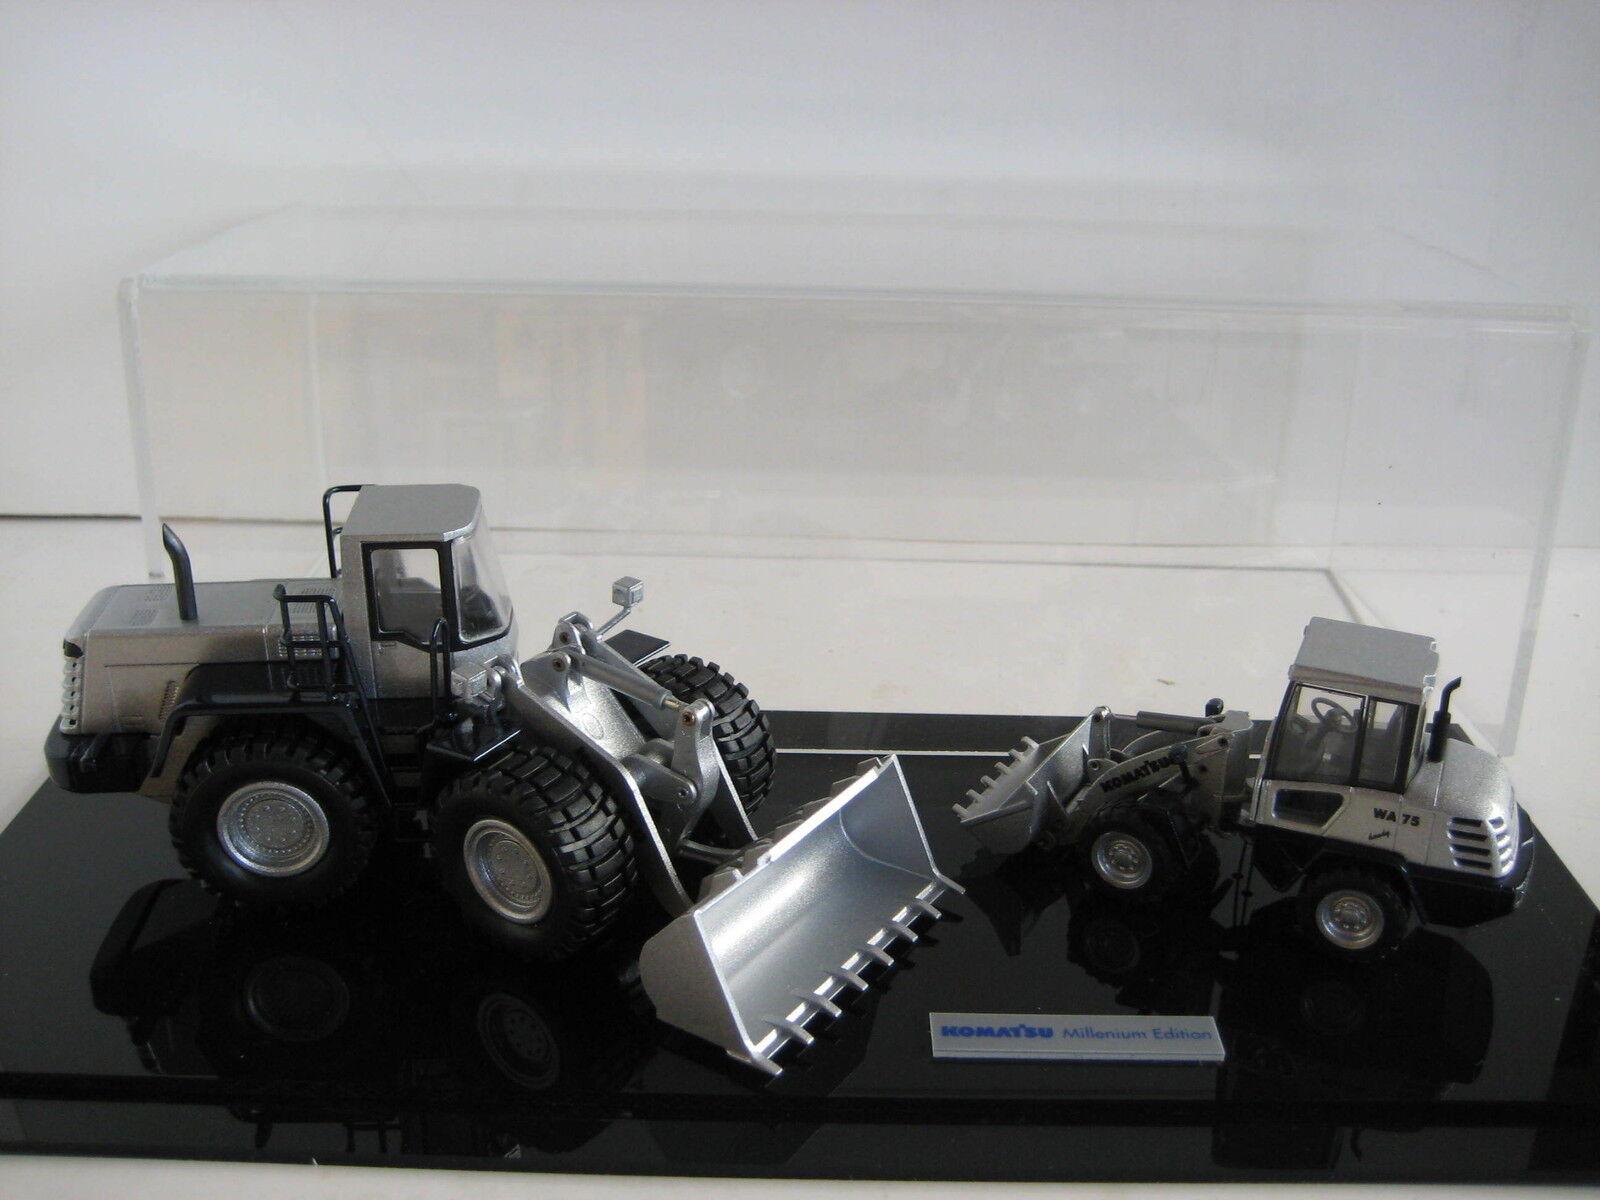 Komatsu wa 470 + 75 loader millenium edition conrad 1 50 original packaging